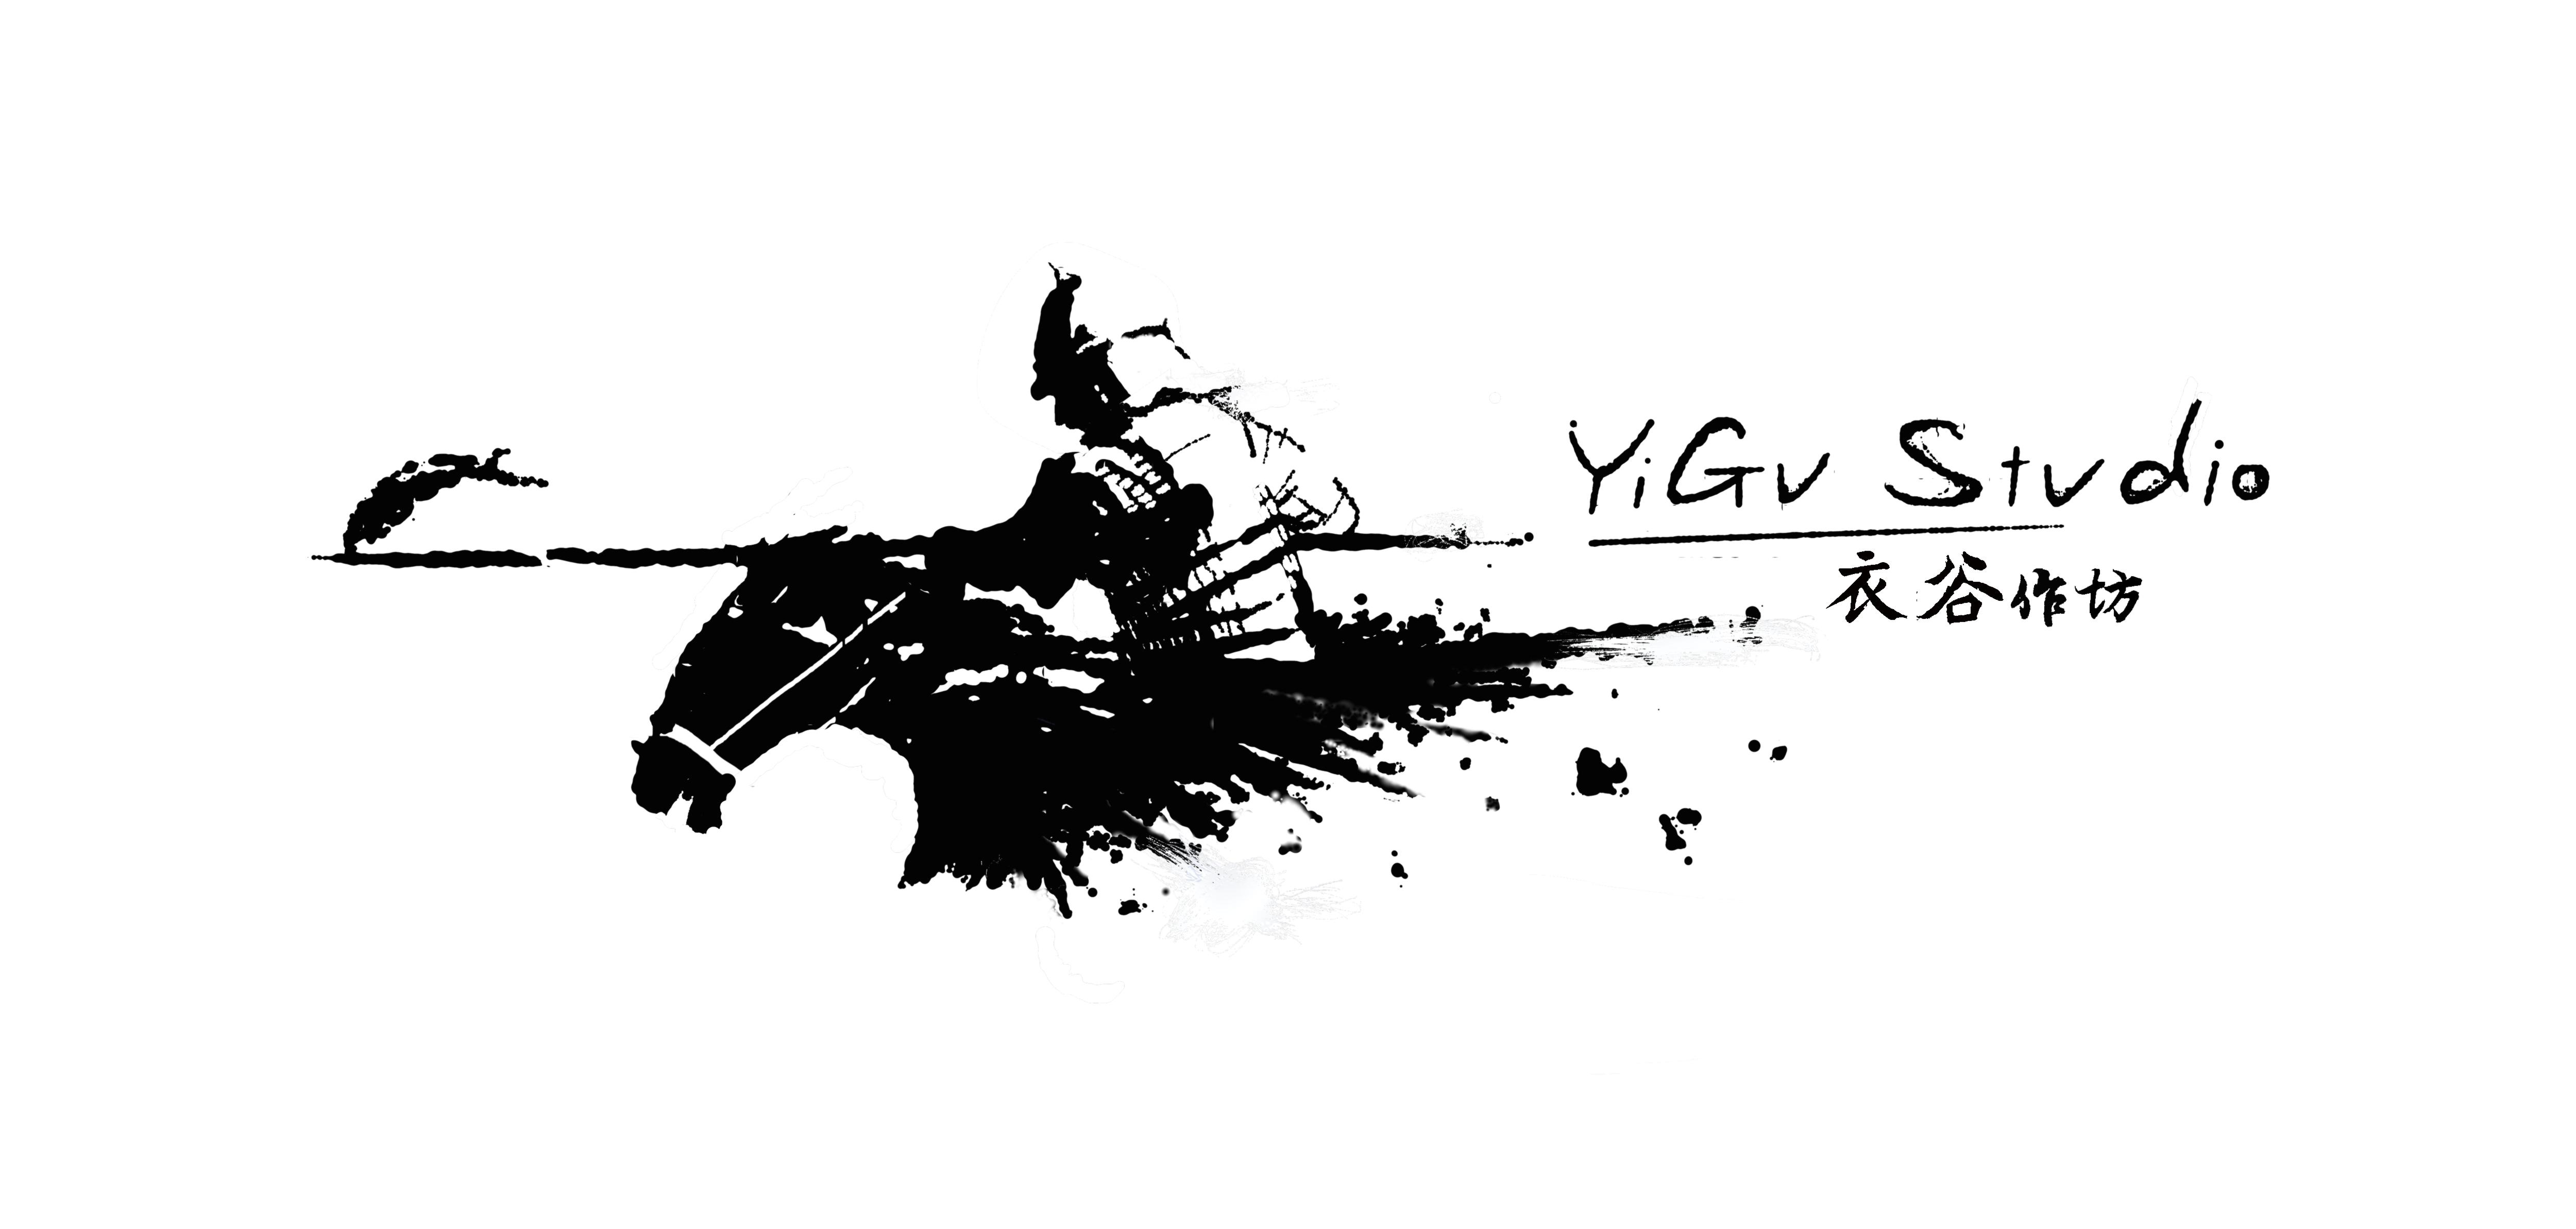 yigu logo 5000 2385